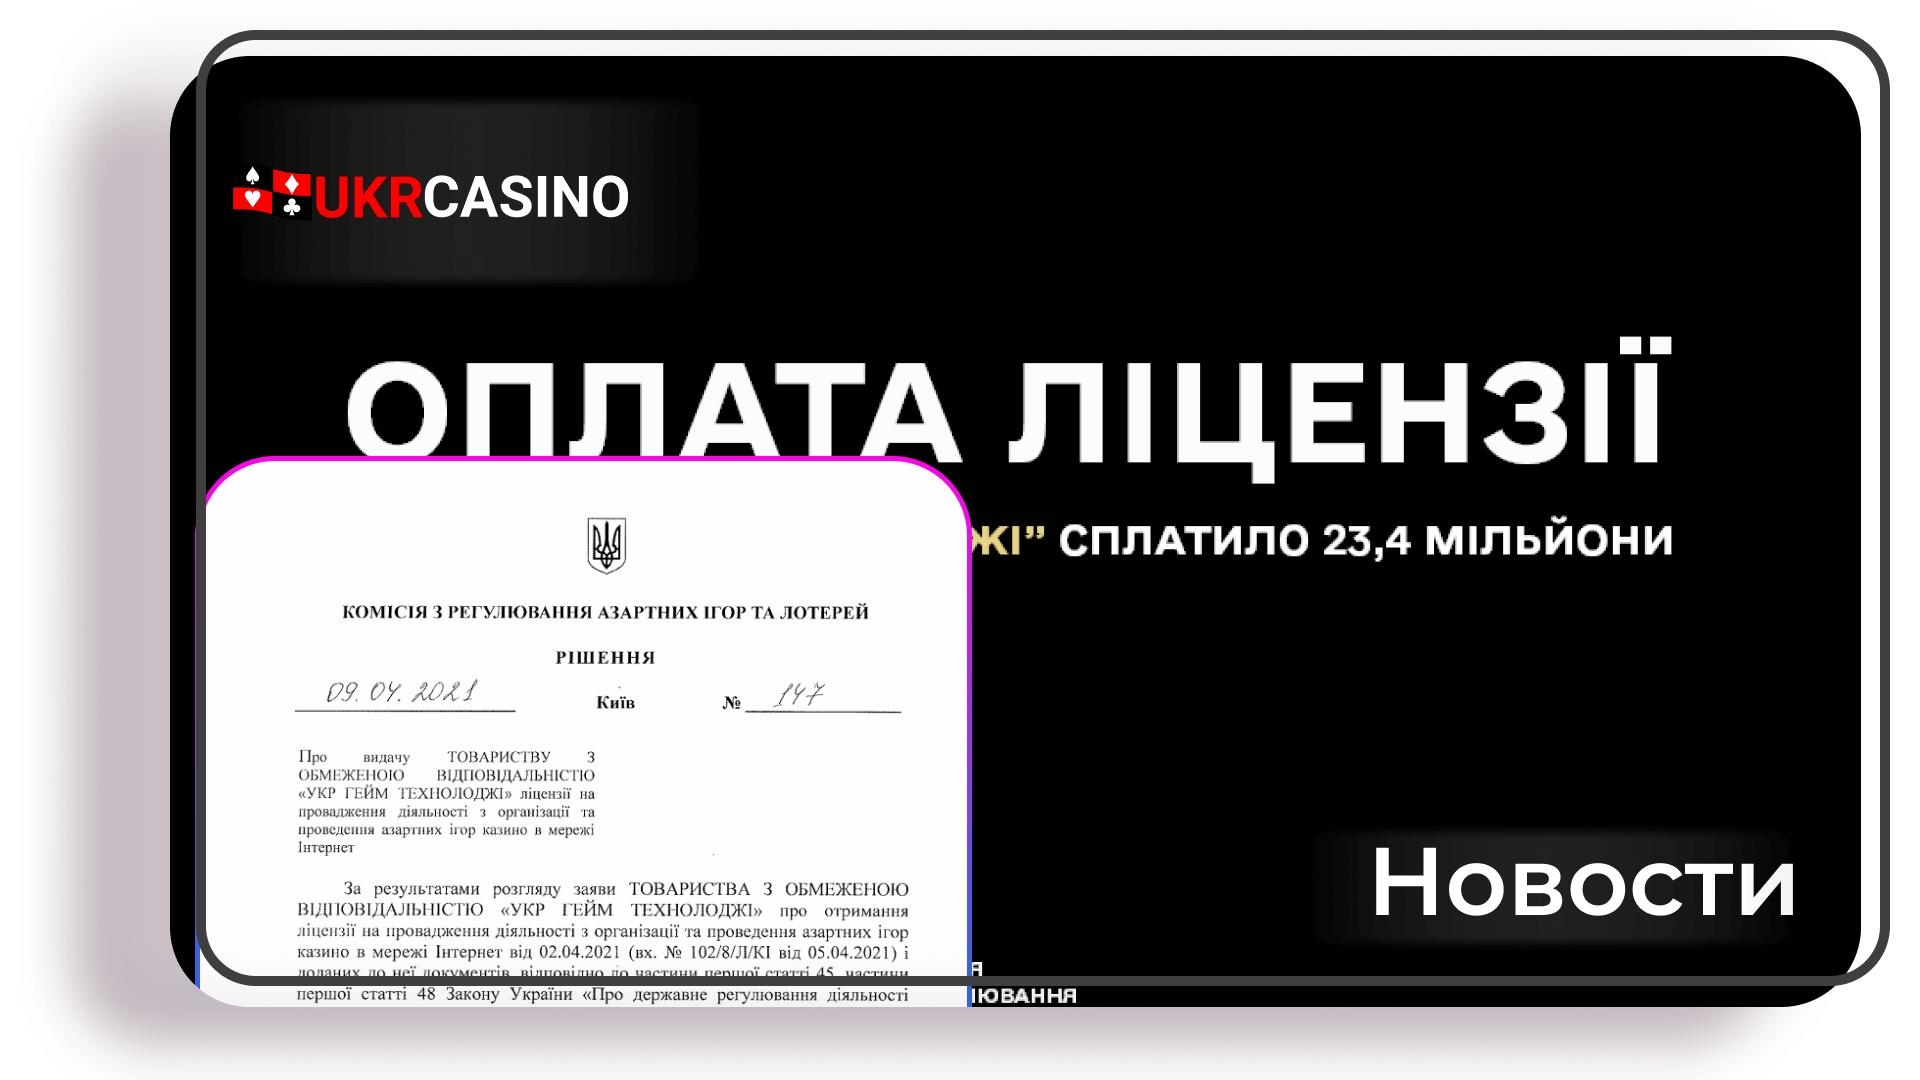 Онлайн-казино оплатило 23,4 миллиона гривен за государственную лицензию